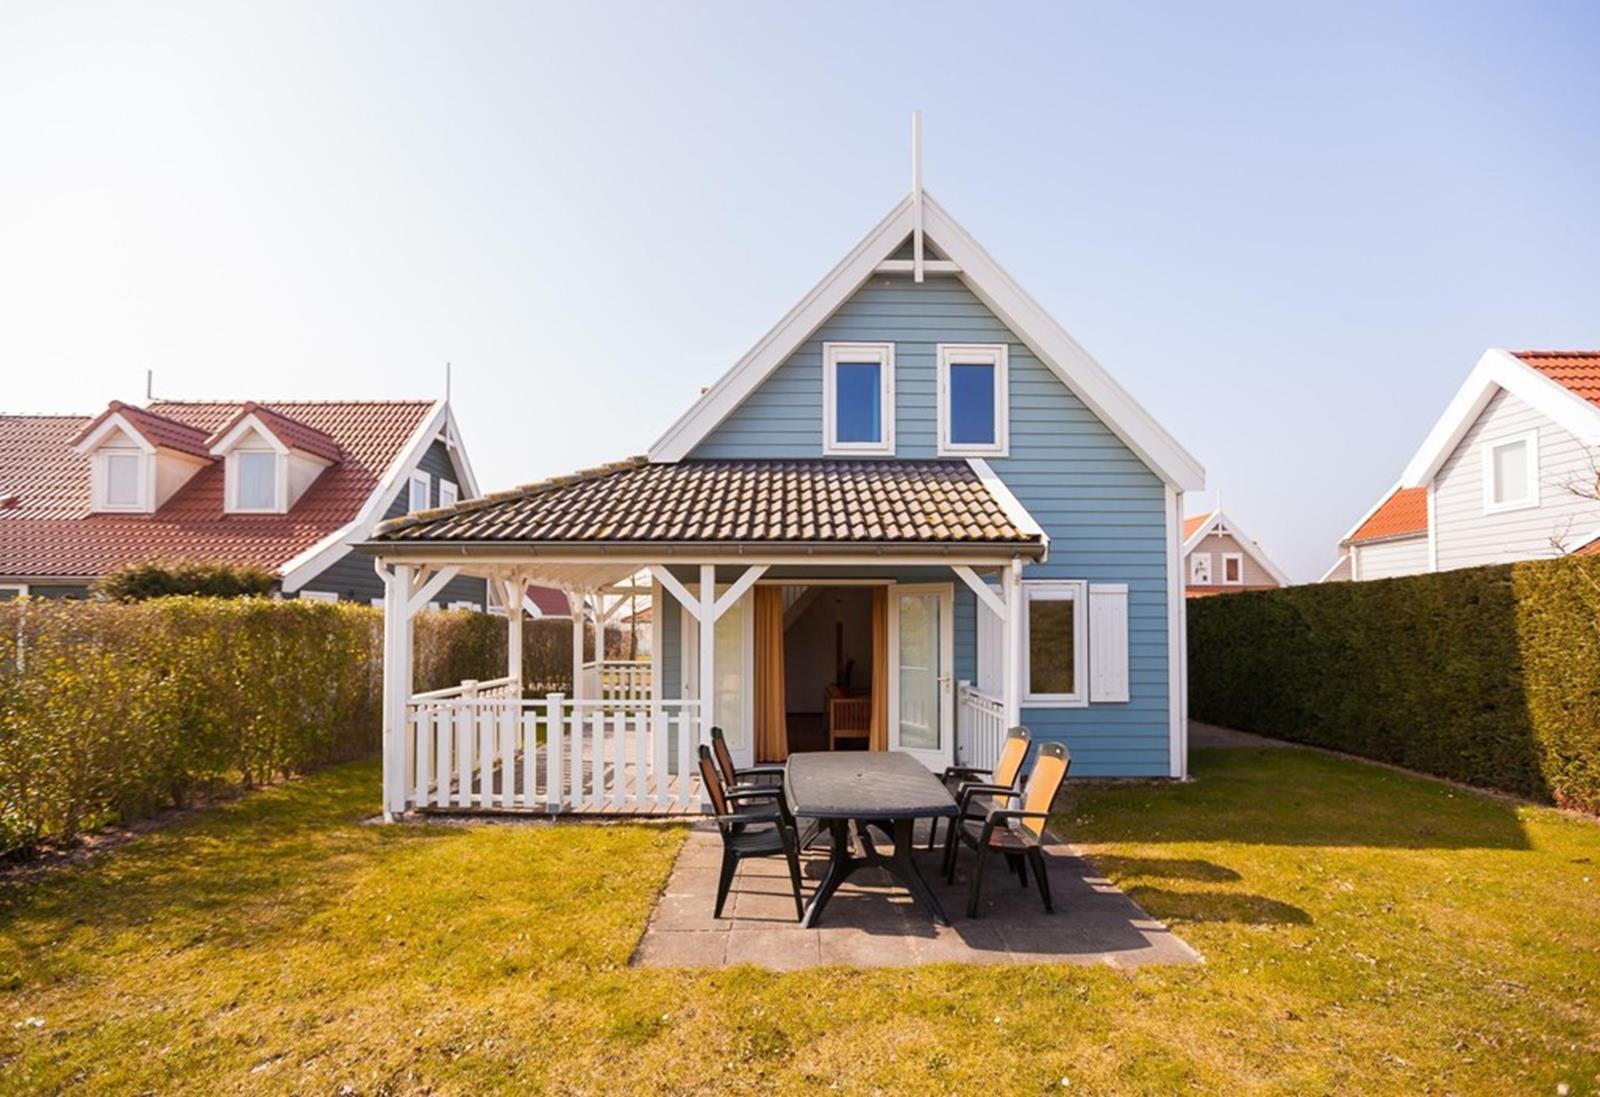 Vakantiehuis te koop Zeeland Bruinisse 004.jpg